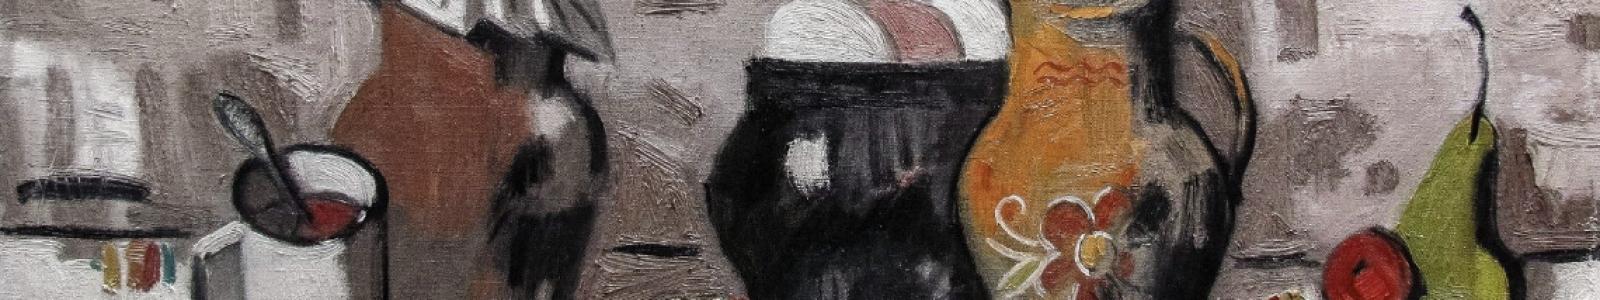 Gallery Painter Vladimir Nosan